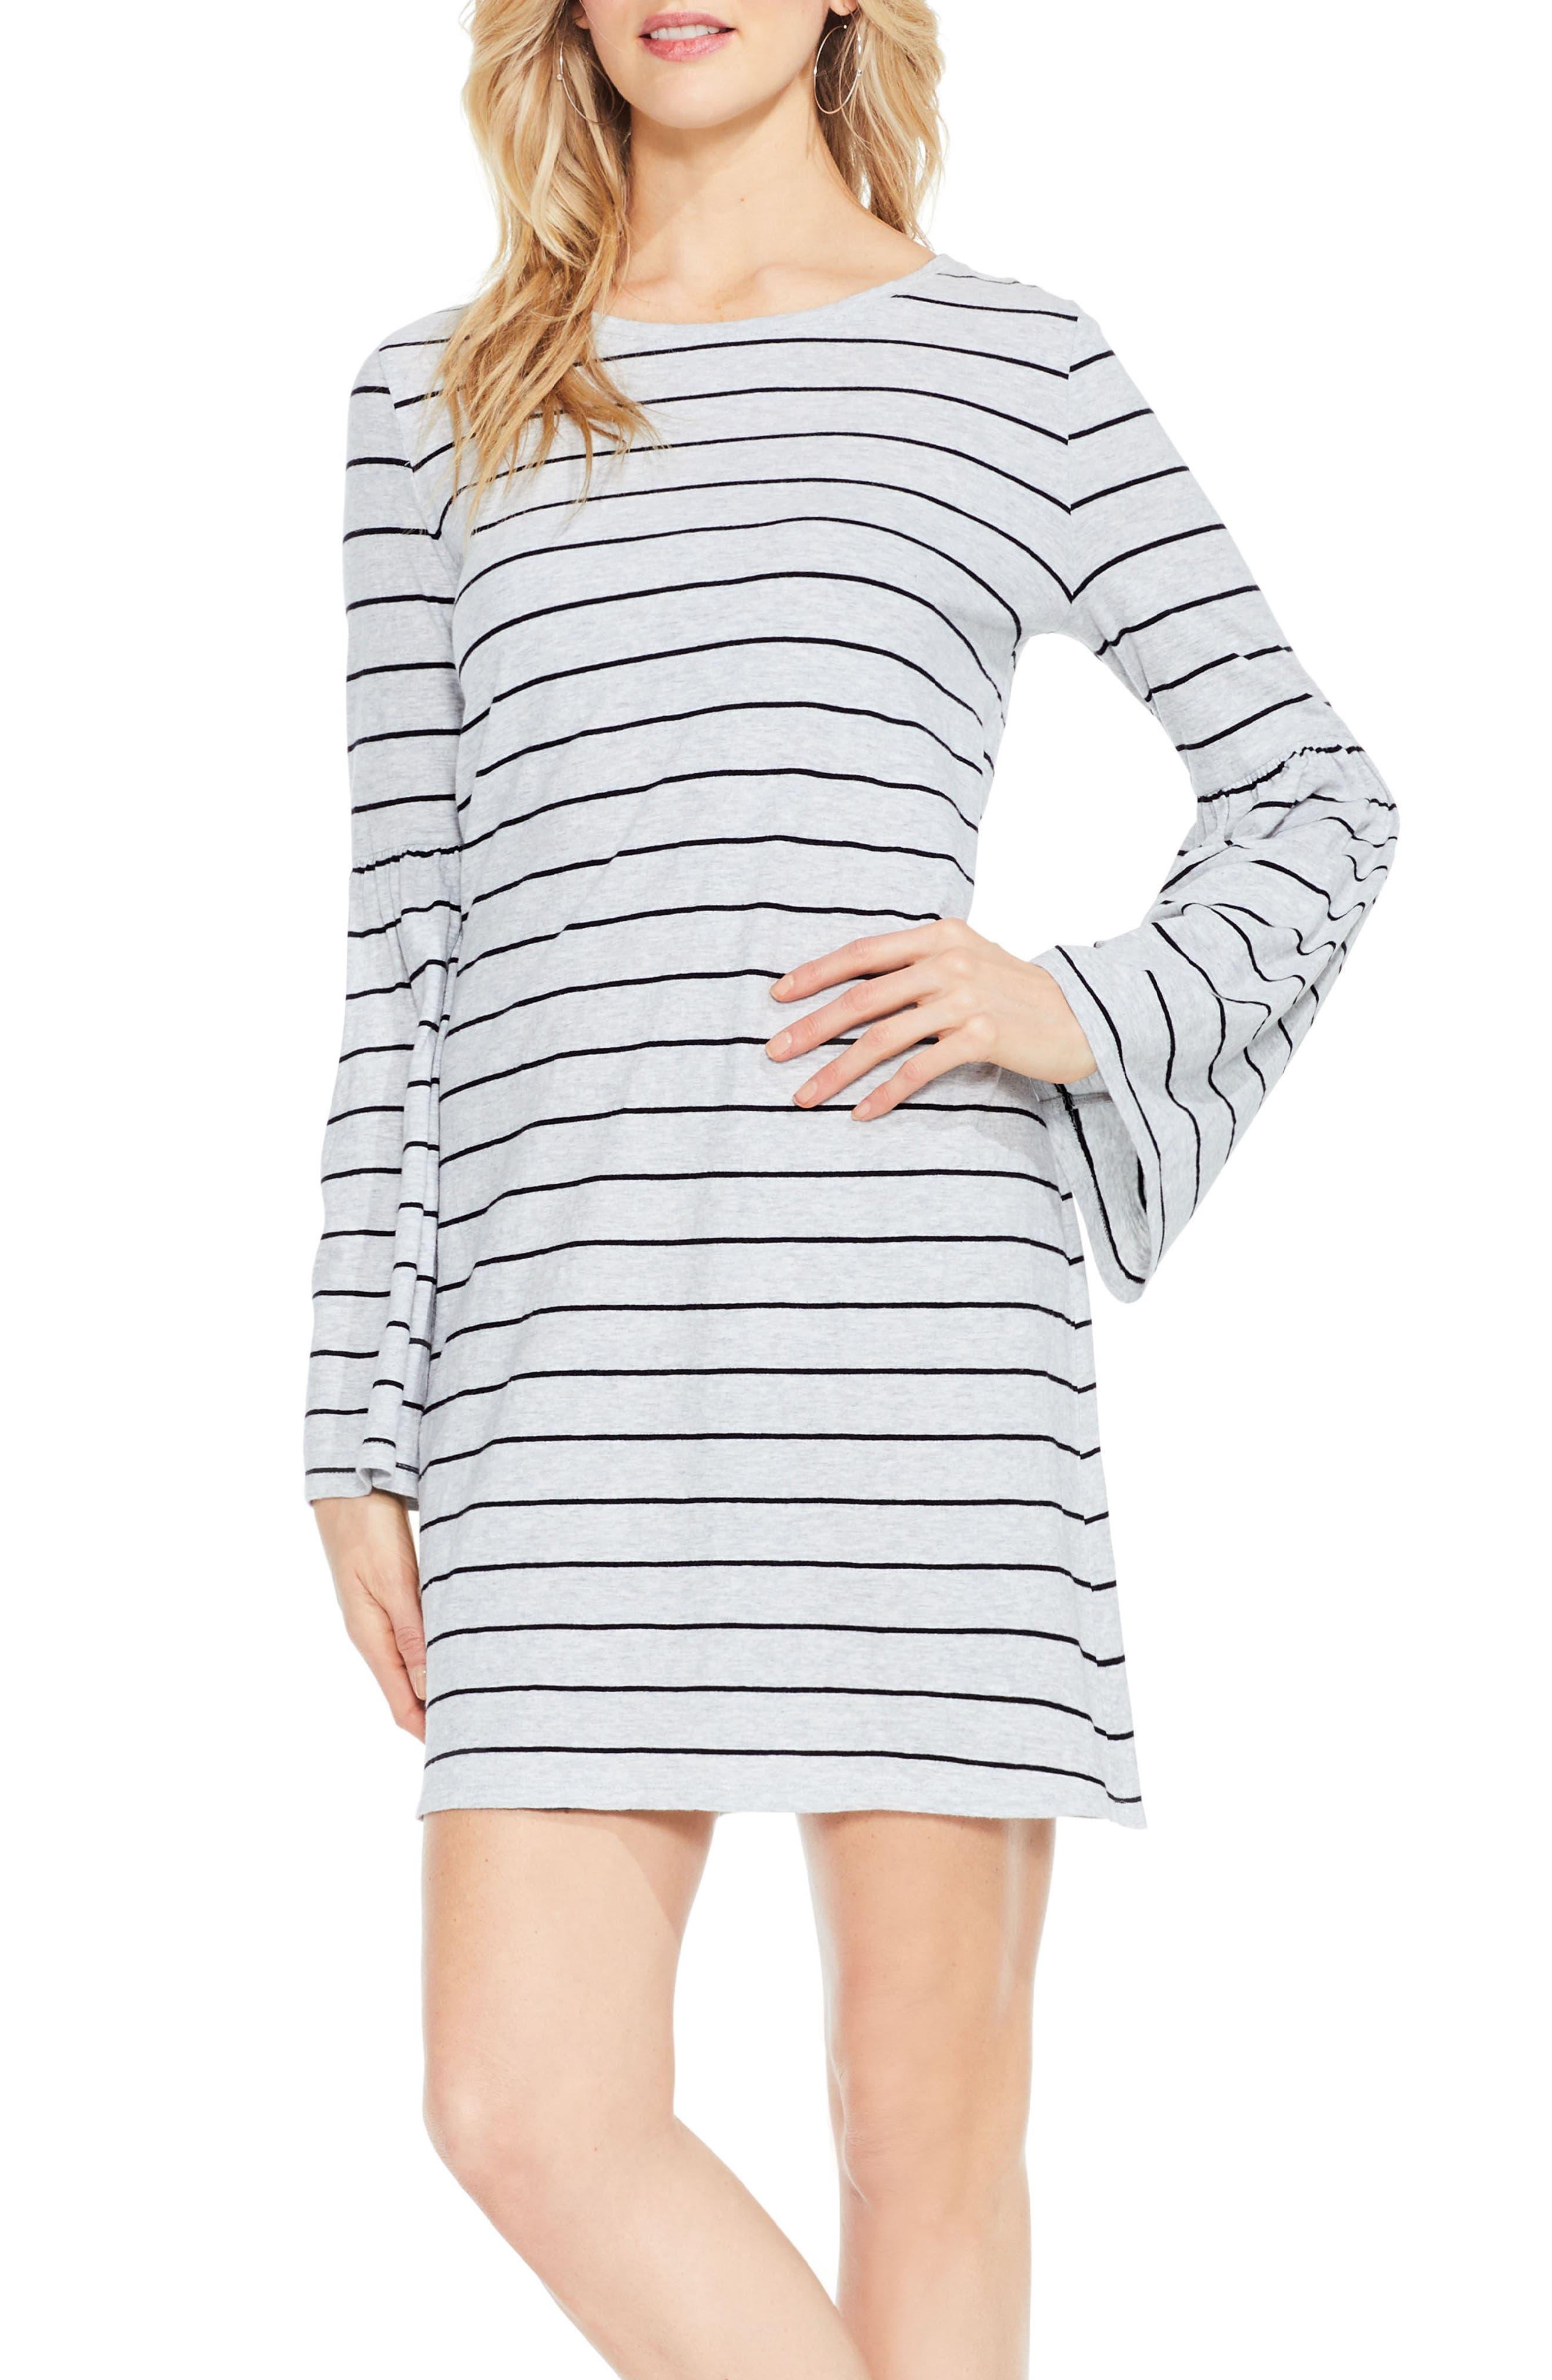 Two by Vince Camuto Nova Stripe Bell Sleeve Dress